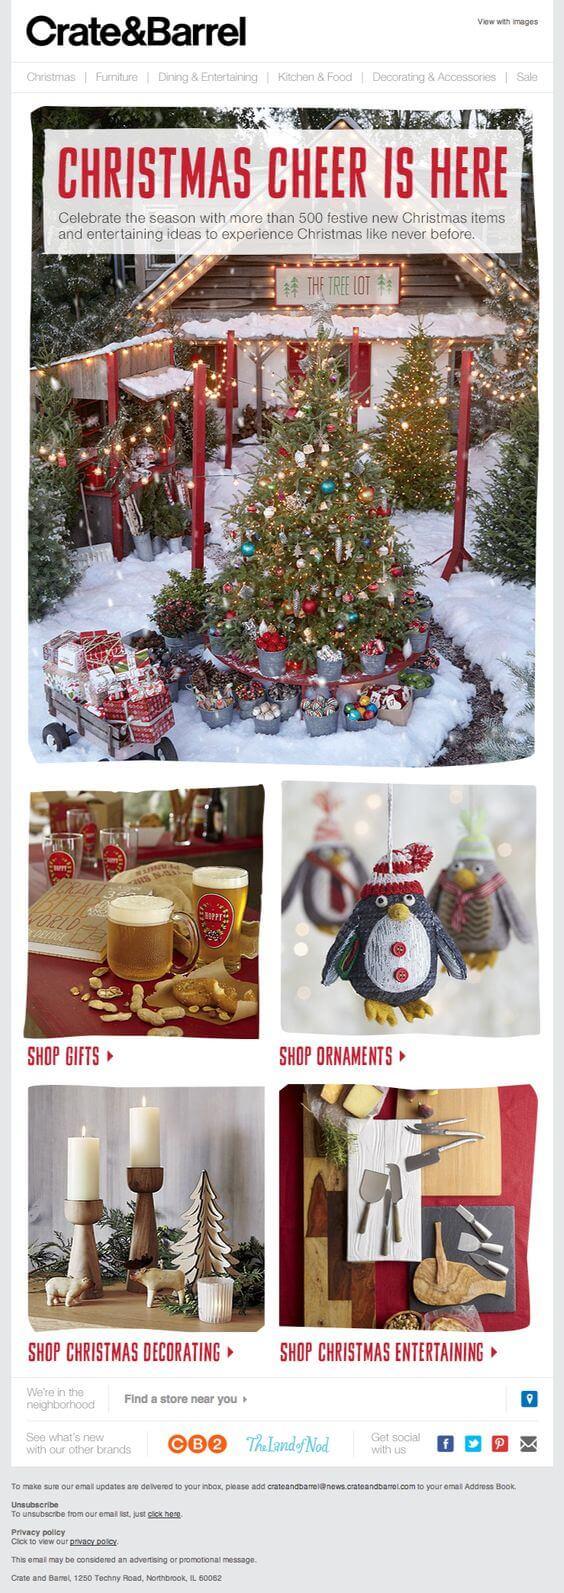 Seasonal promotion email example